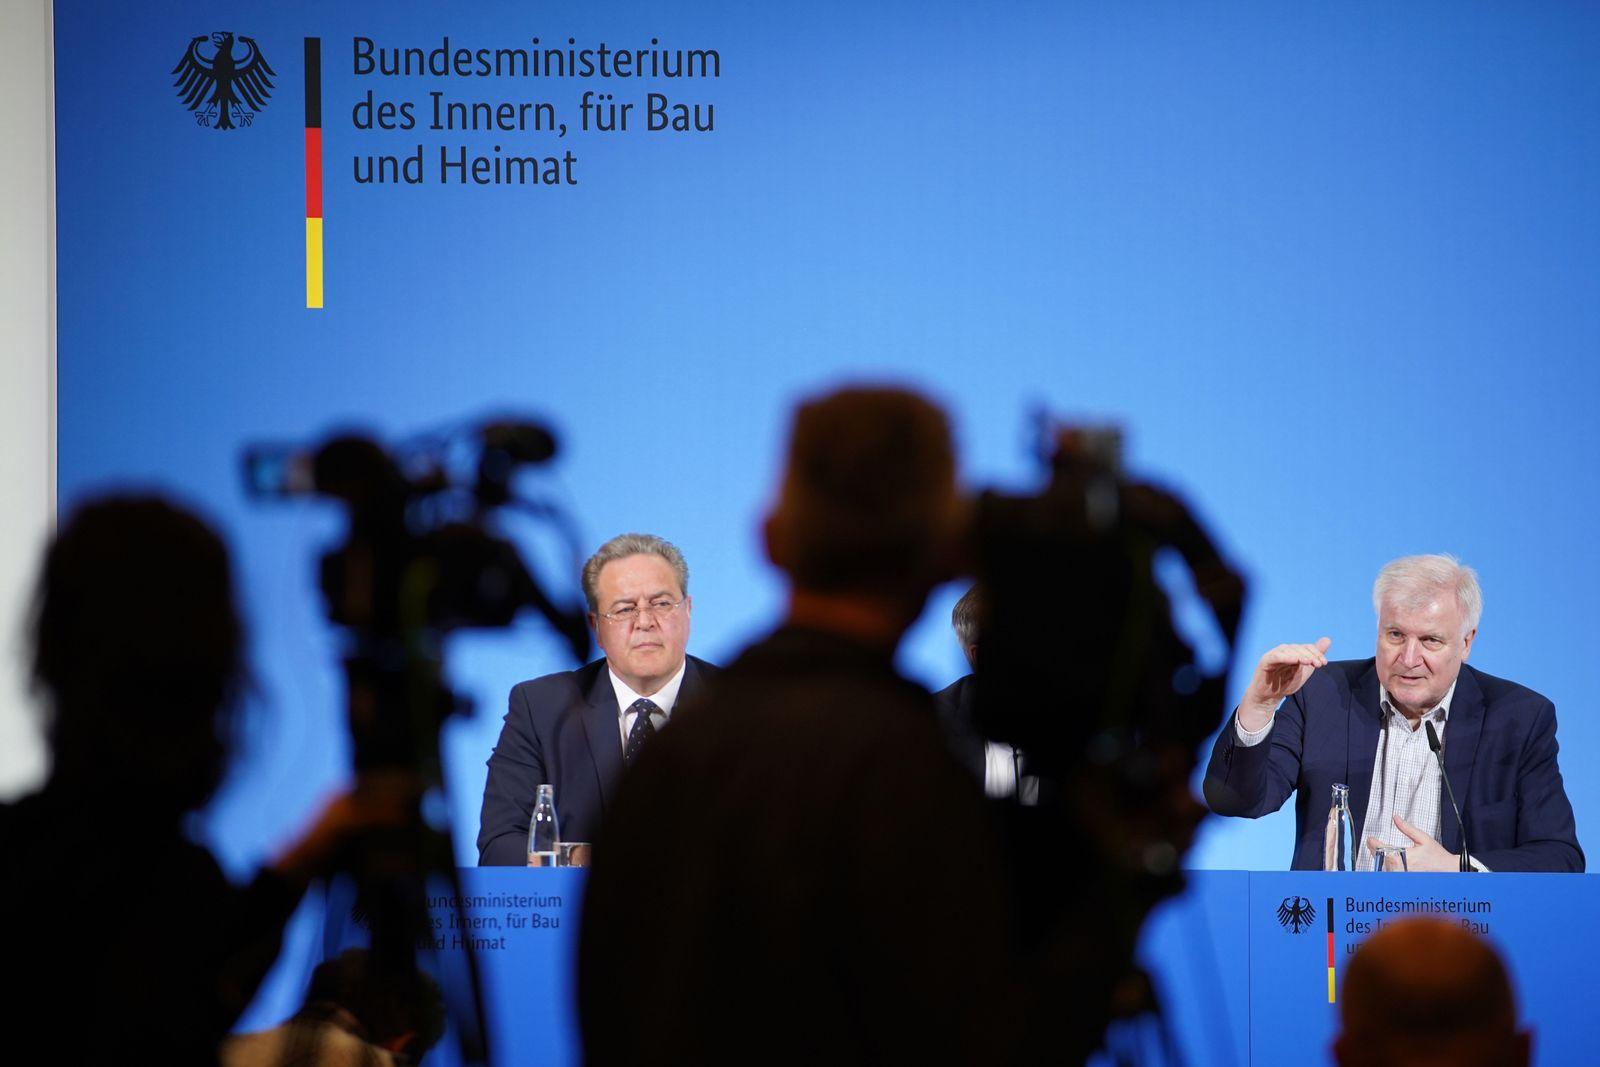 German Interior Minister Seehofer comments on coronavirus, Berlin, Germany - 15 Mar 2020